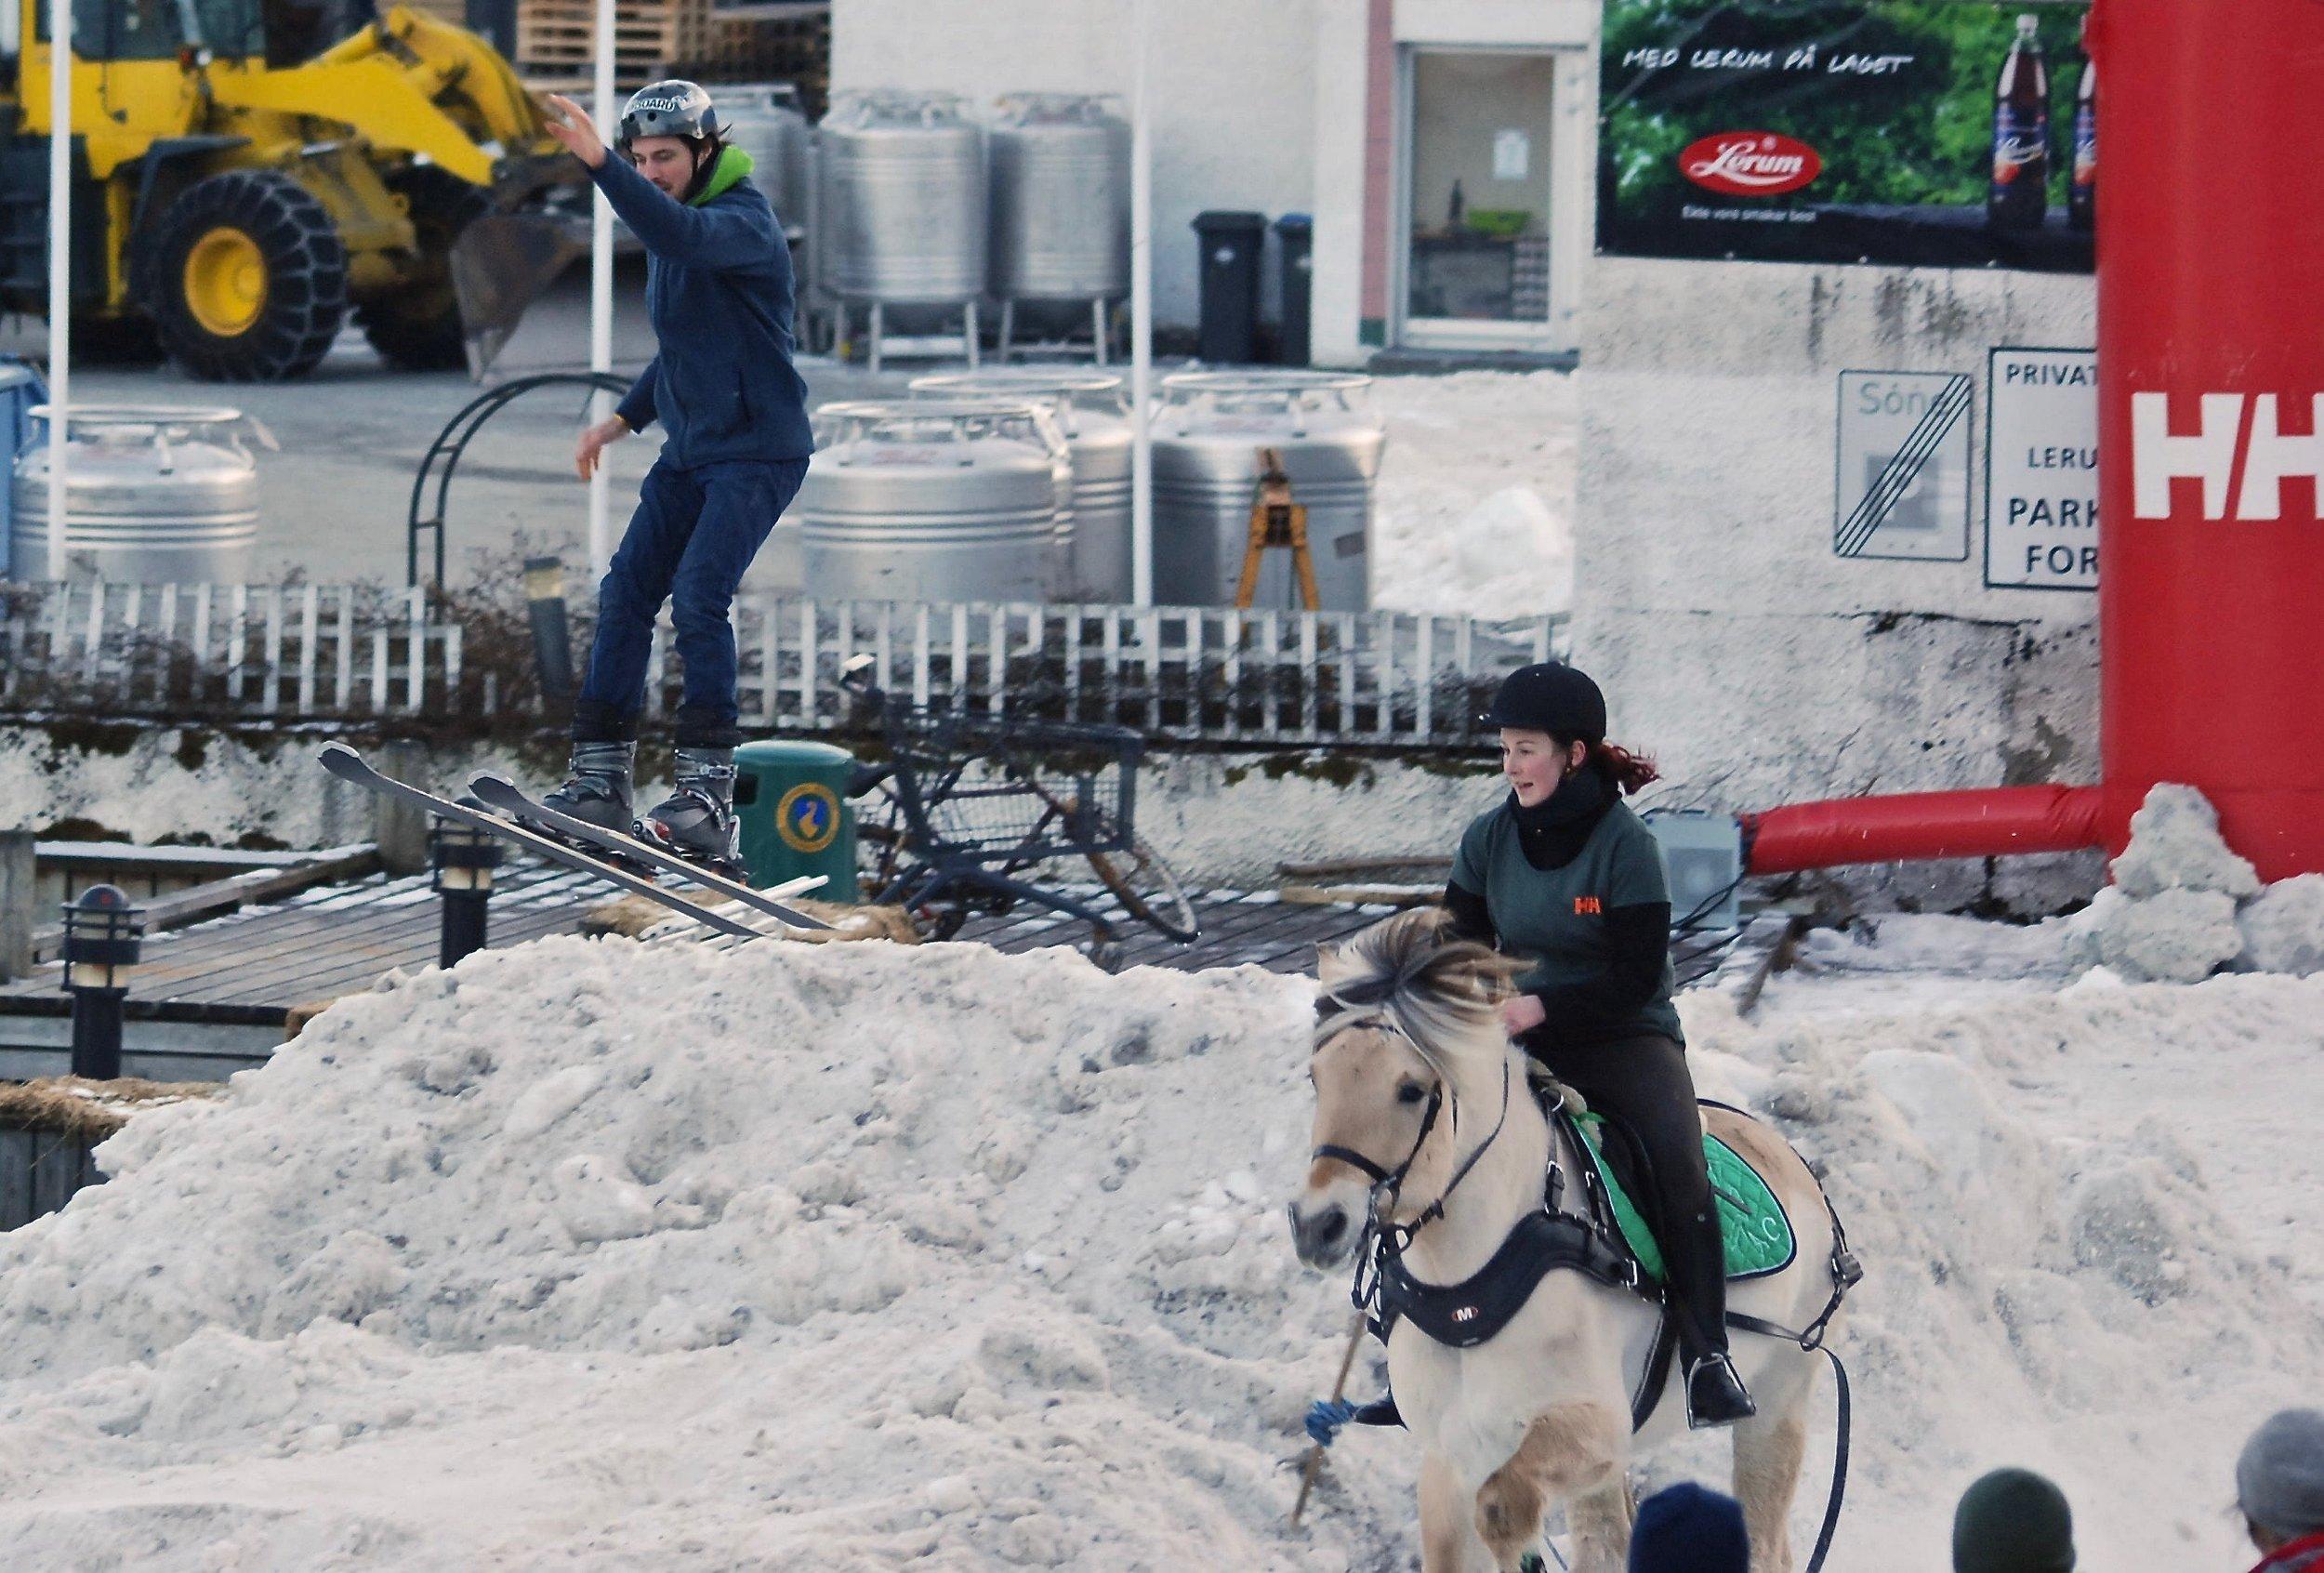 Hestehopp_2018_EliseHettyEngedal_3.jpg